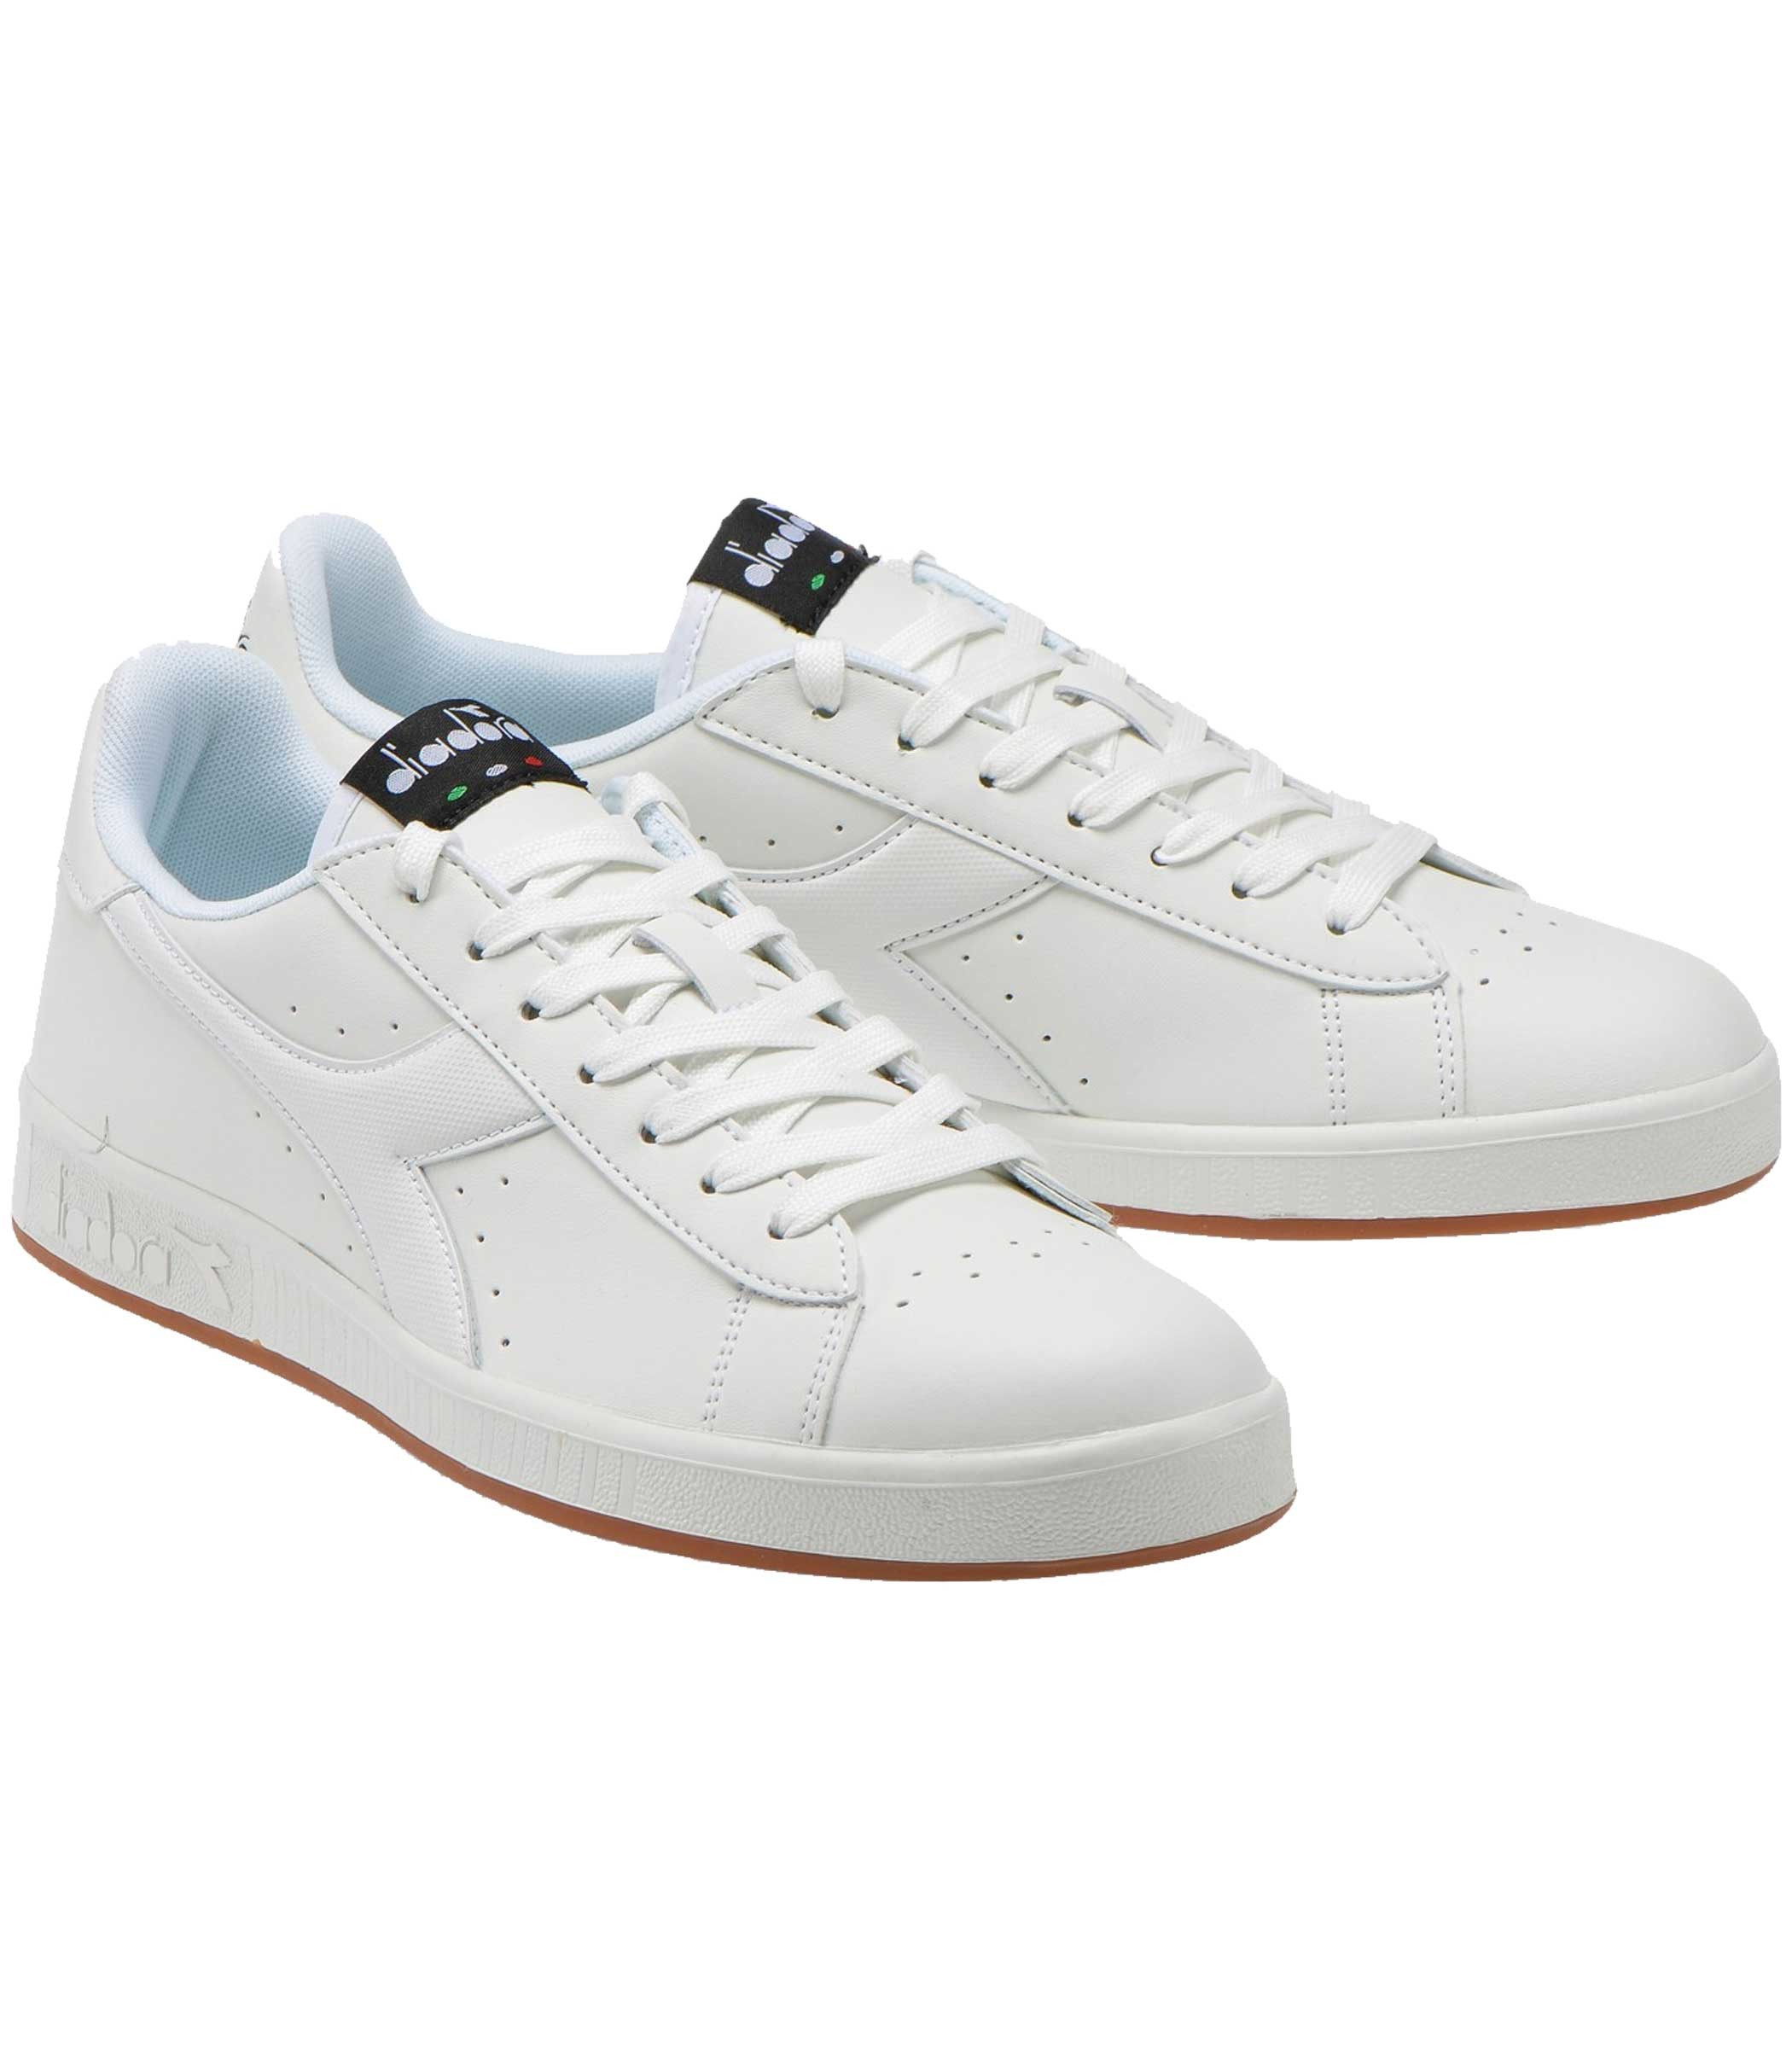 181880739dad5 Da Diadora Sneakers P Rif 101 Uomo Scarpe 160281 Game qITwxn5Sp